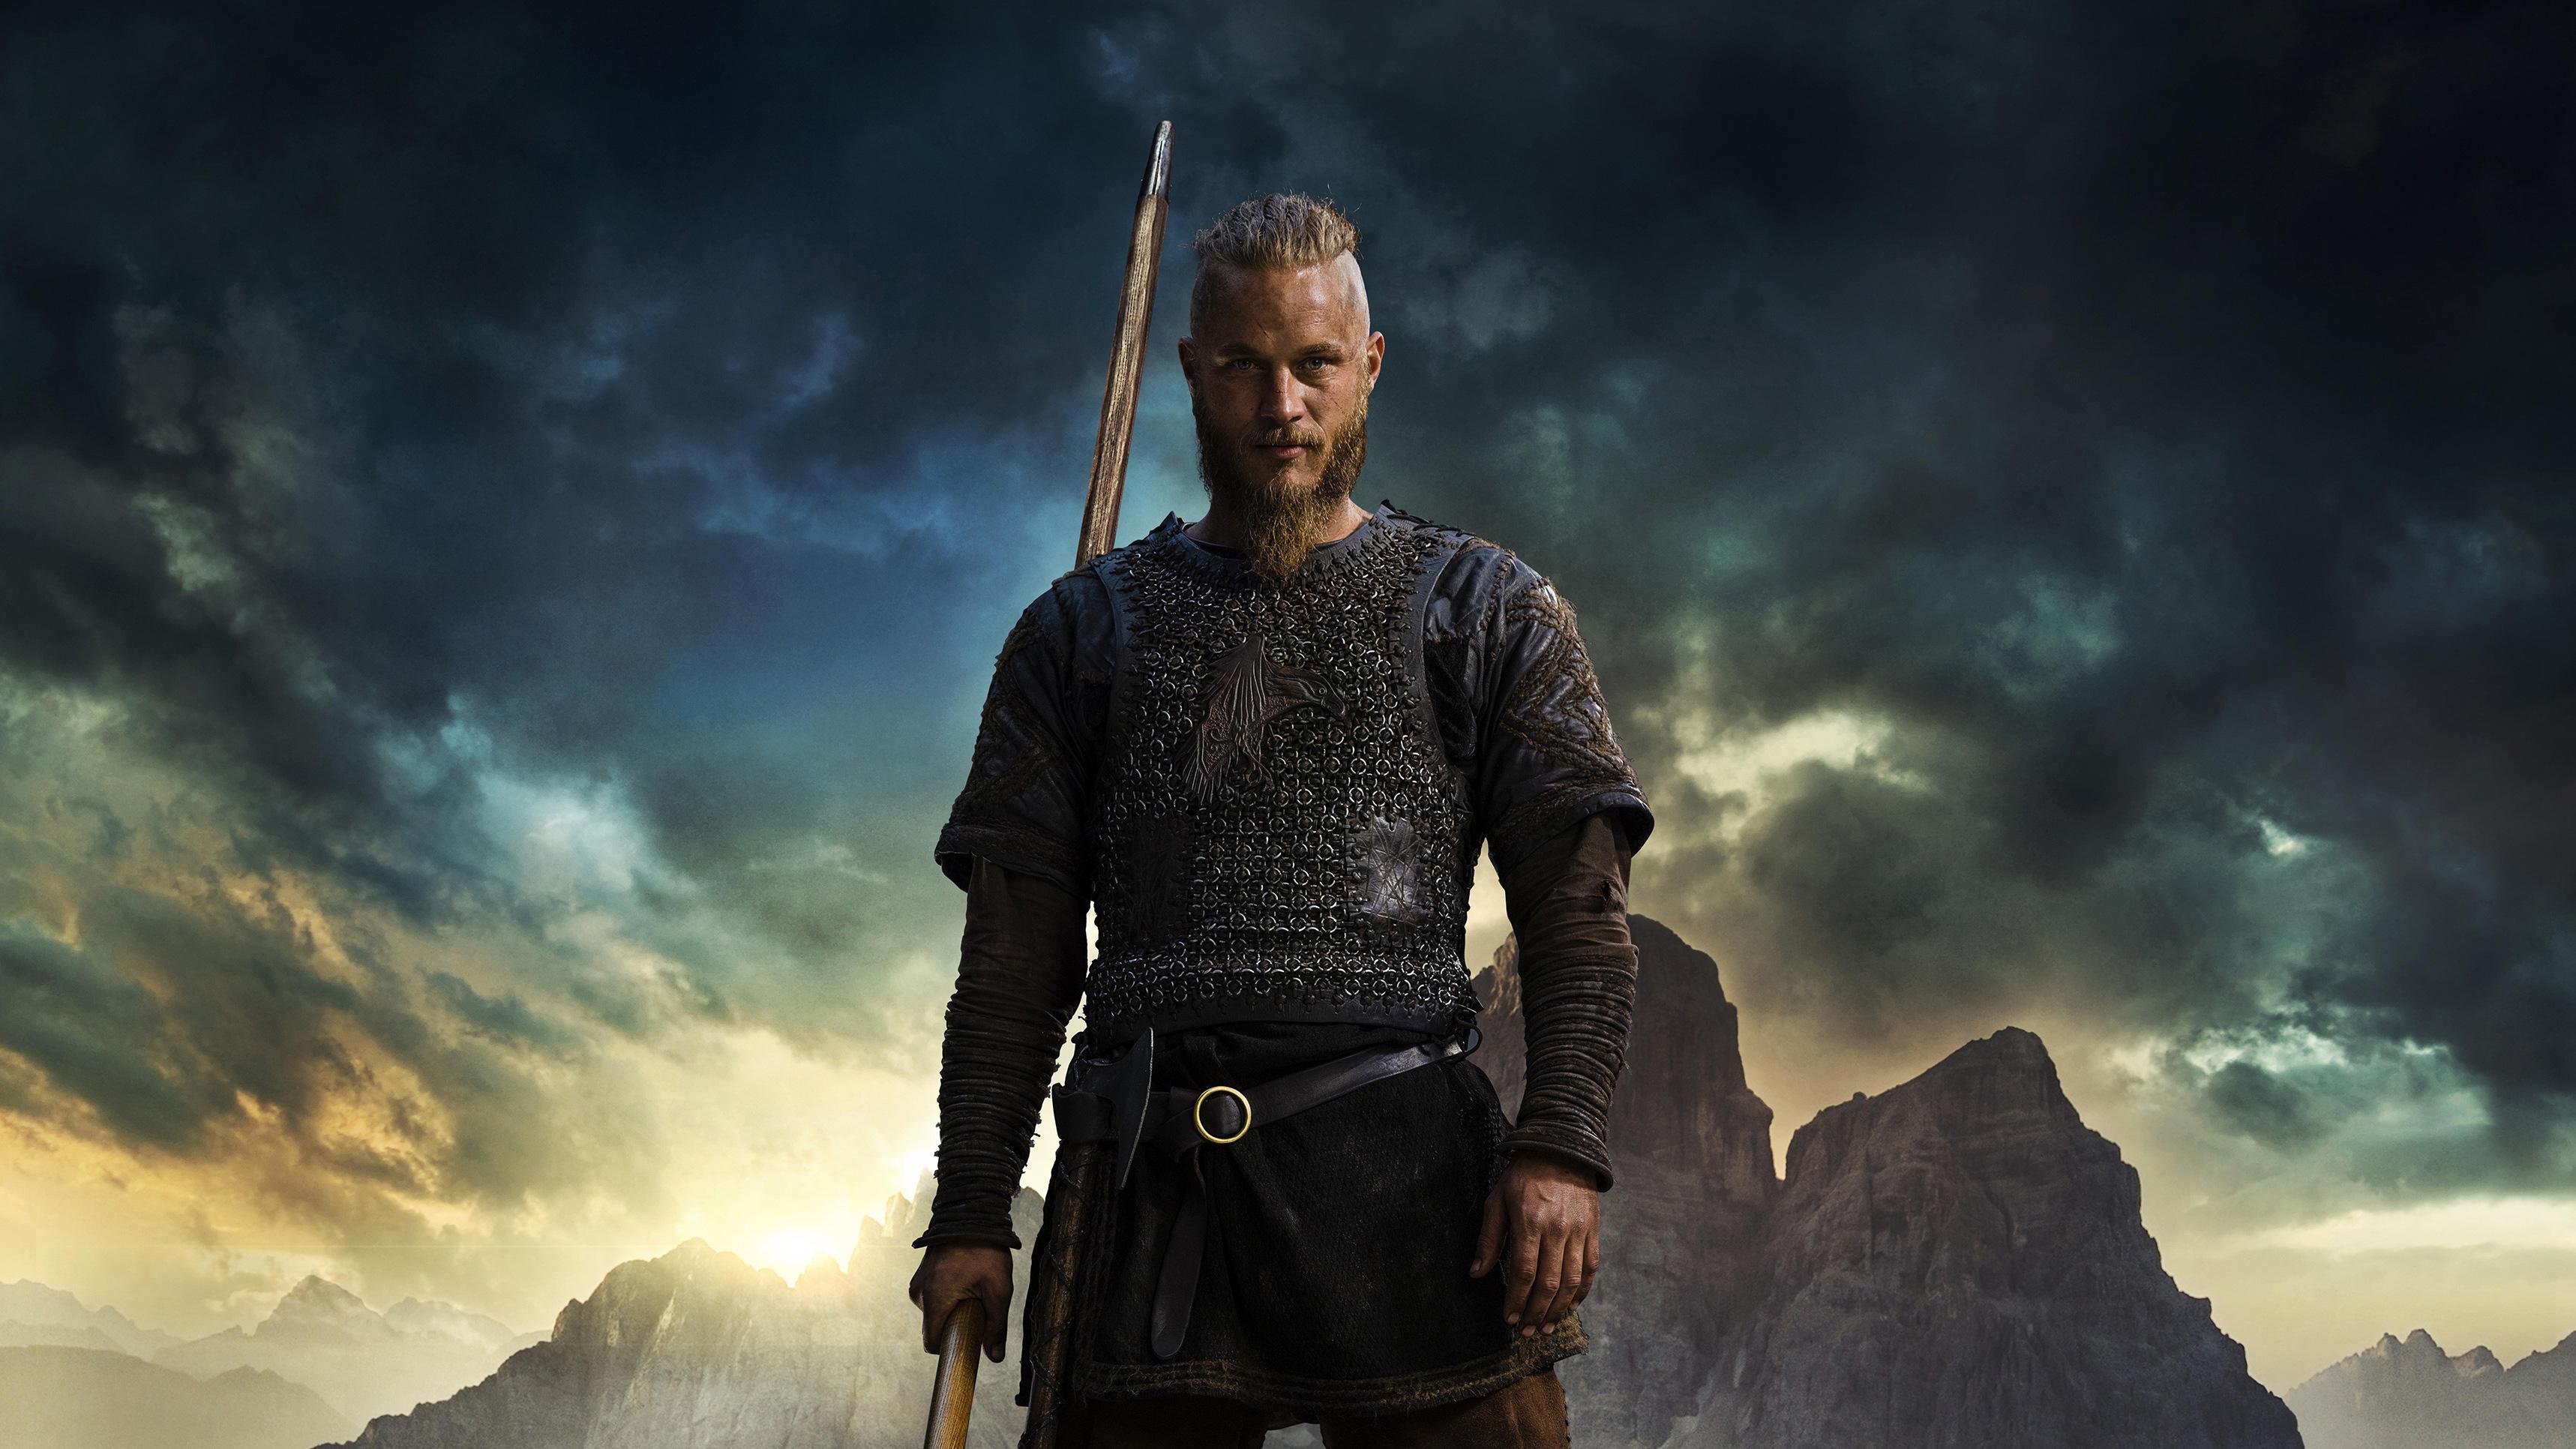 Vikings Ragnar 4k Hd Tv Shows 4k Wallpapers Images